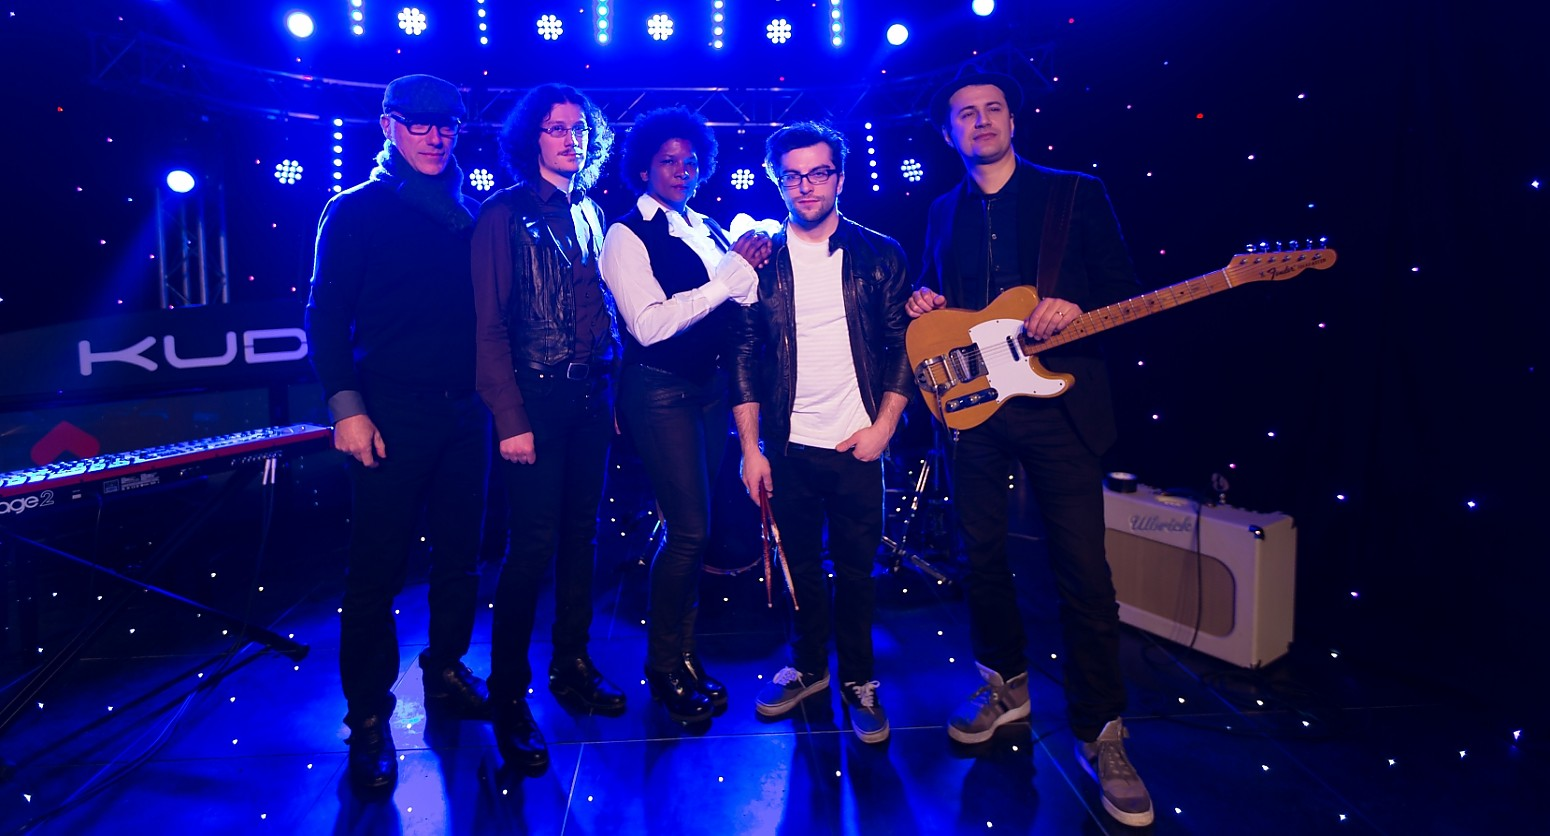 Funk Band